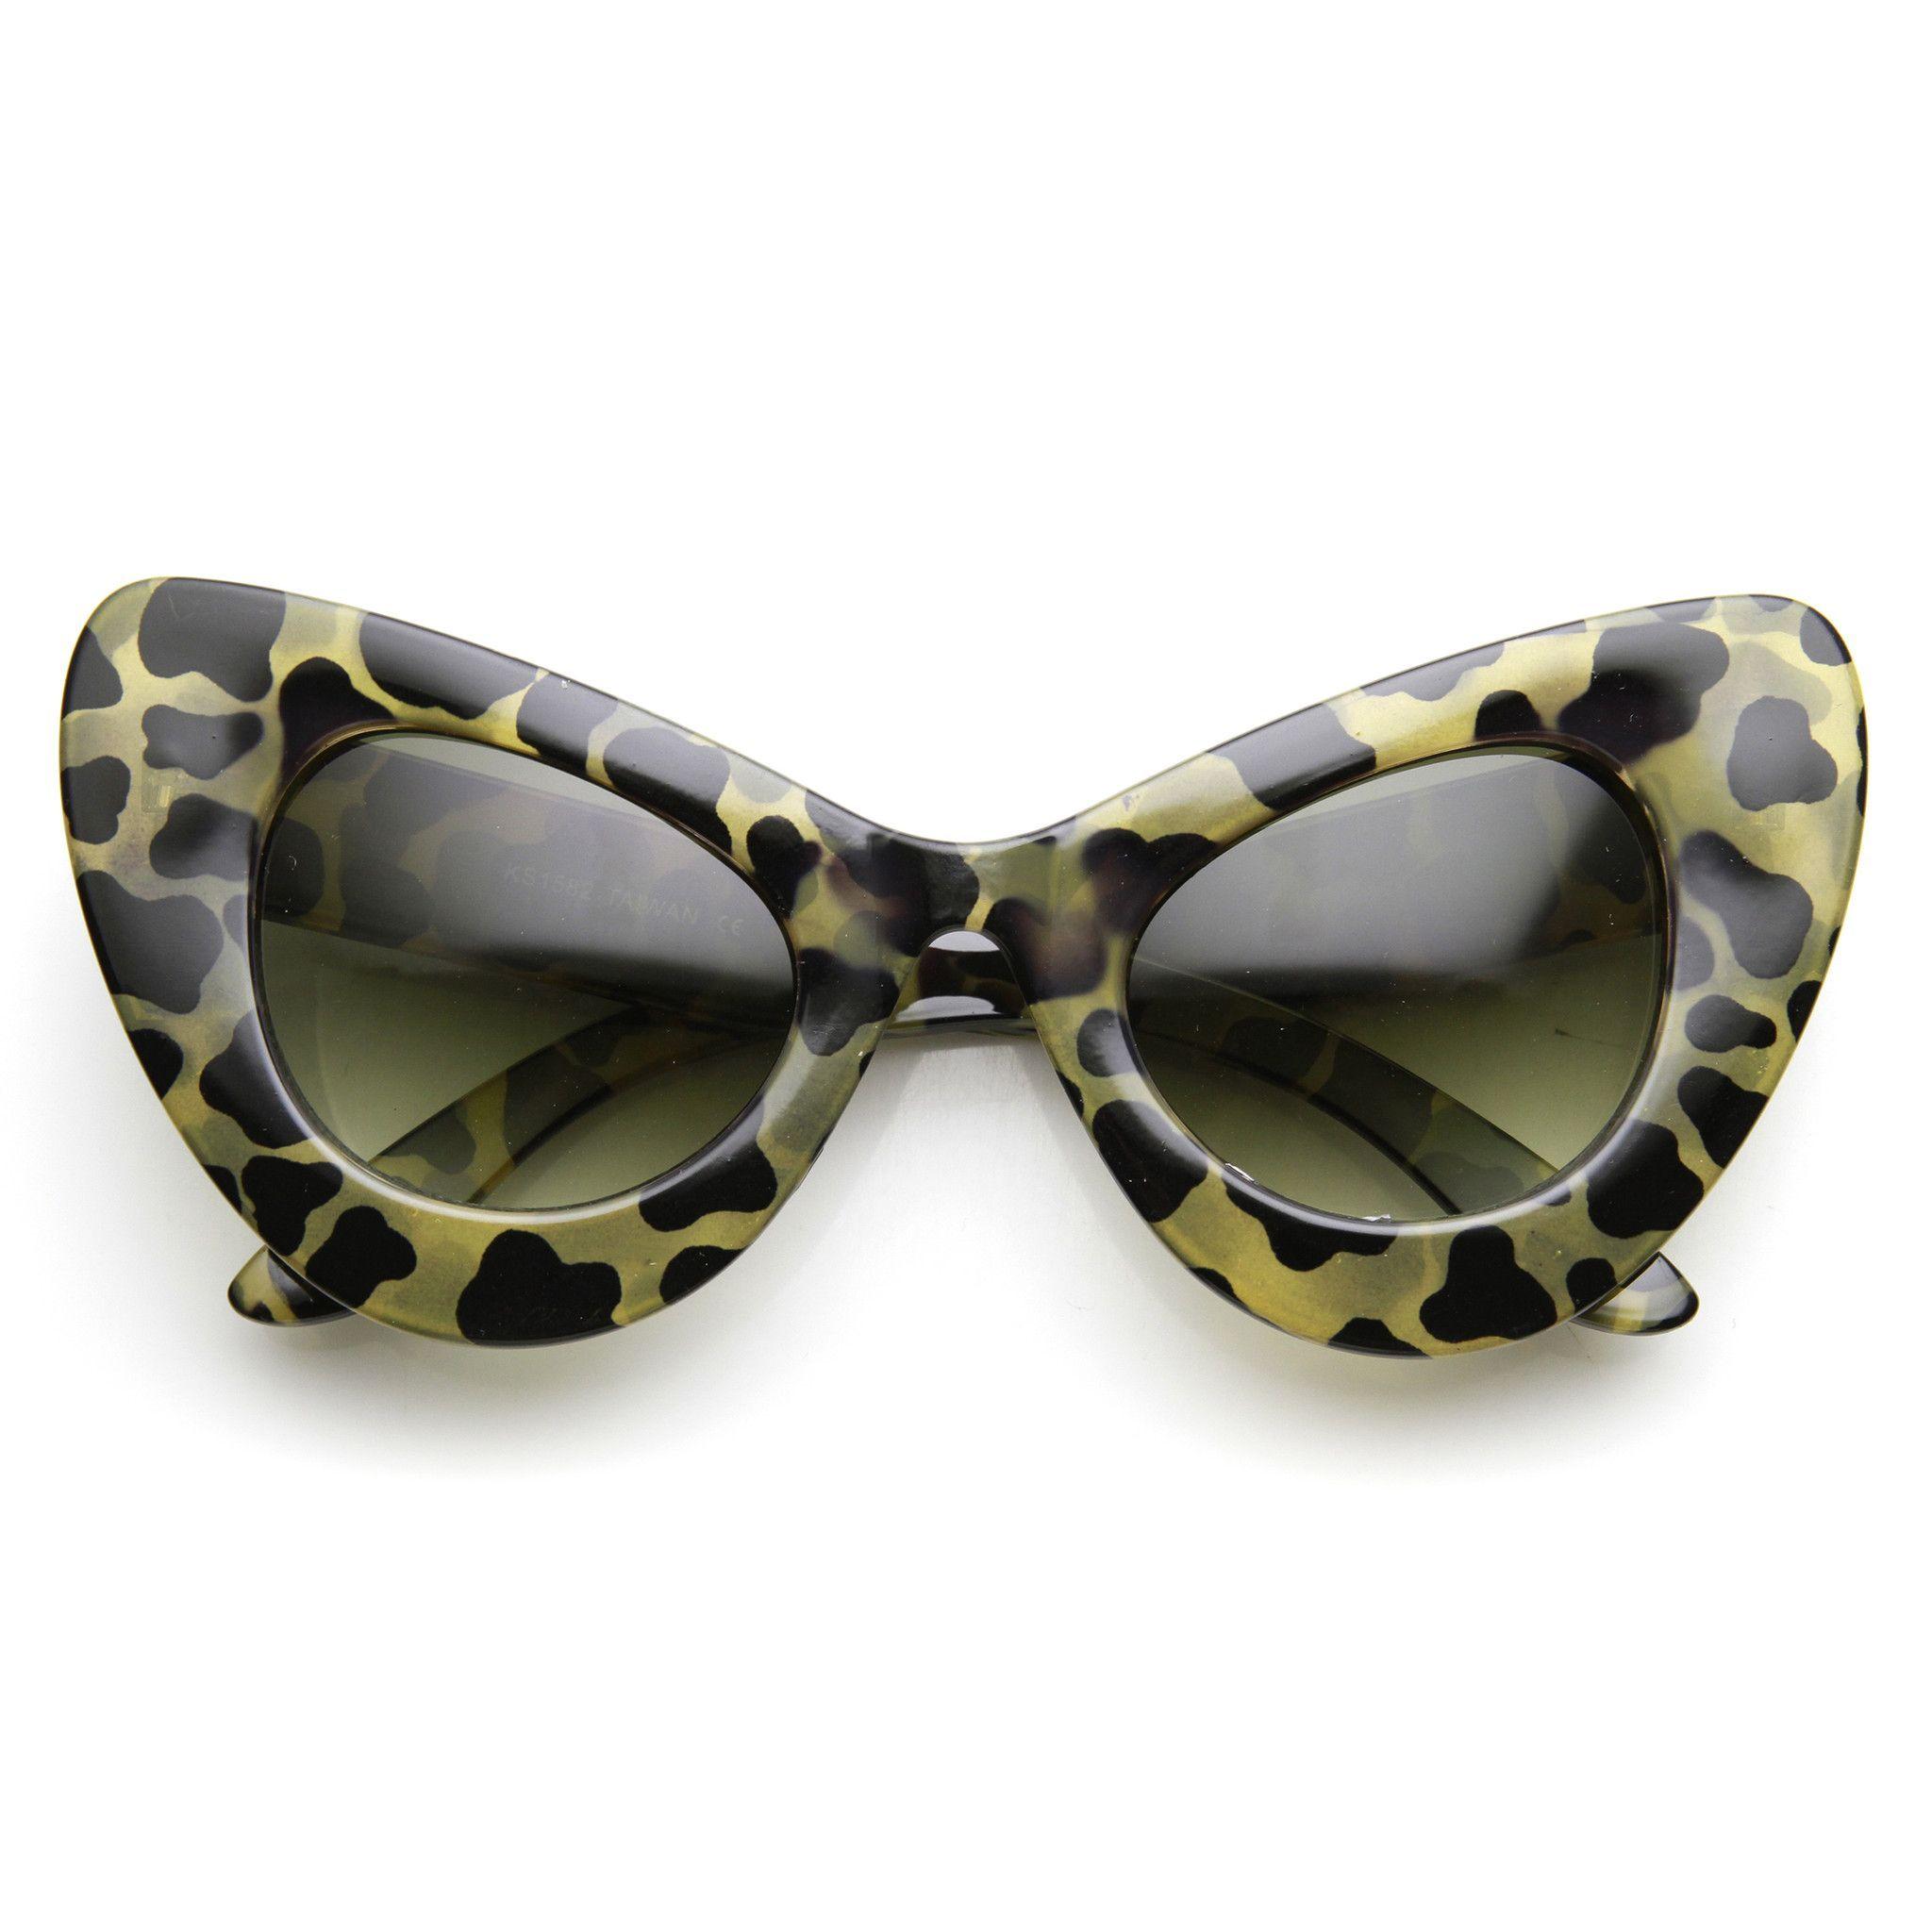 5c86c665fb High Fashion Bold Oversized Women s Cat Eye Sunglasses